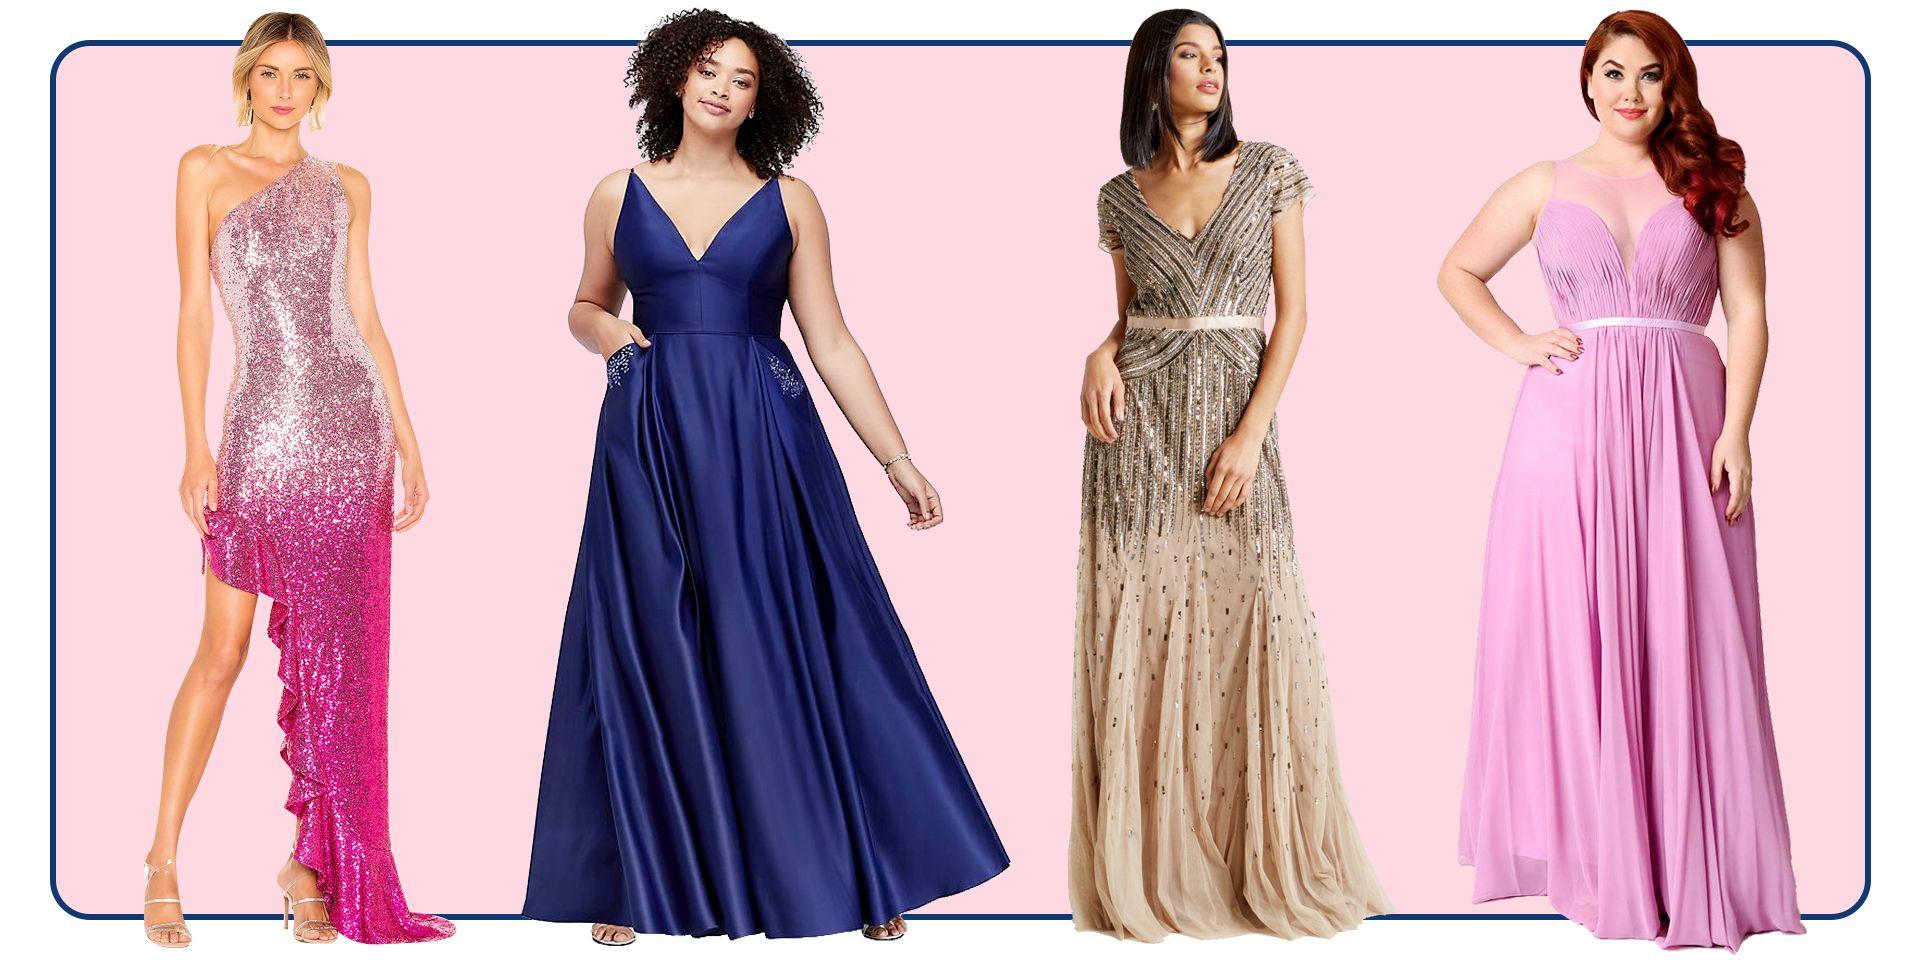 Guy Prom Dresses 2018